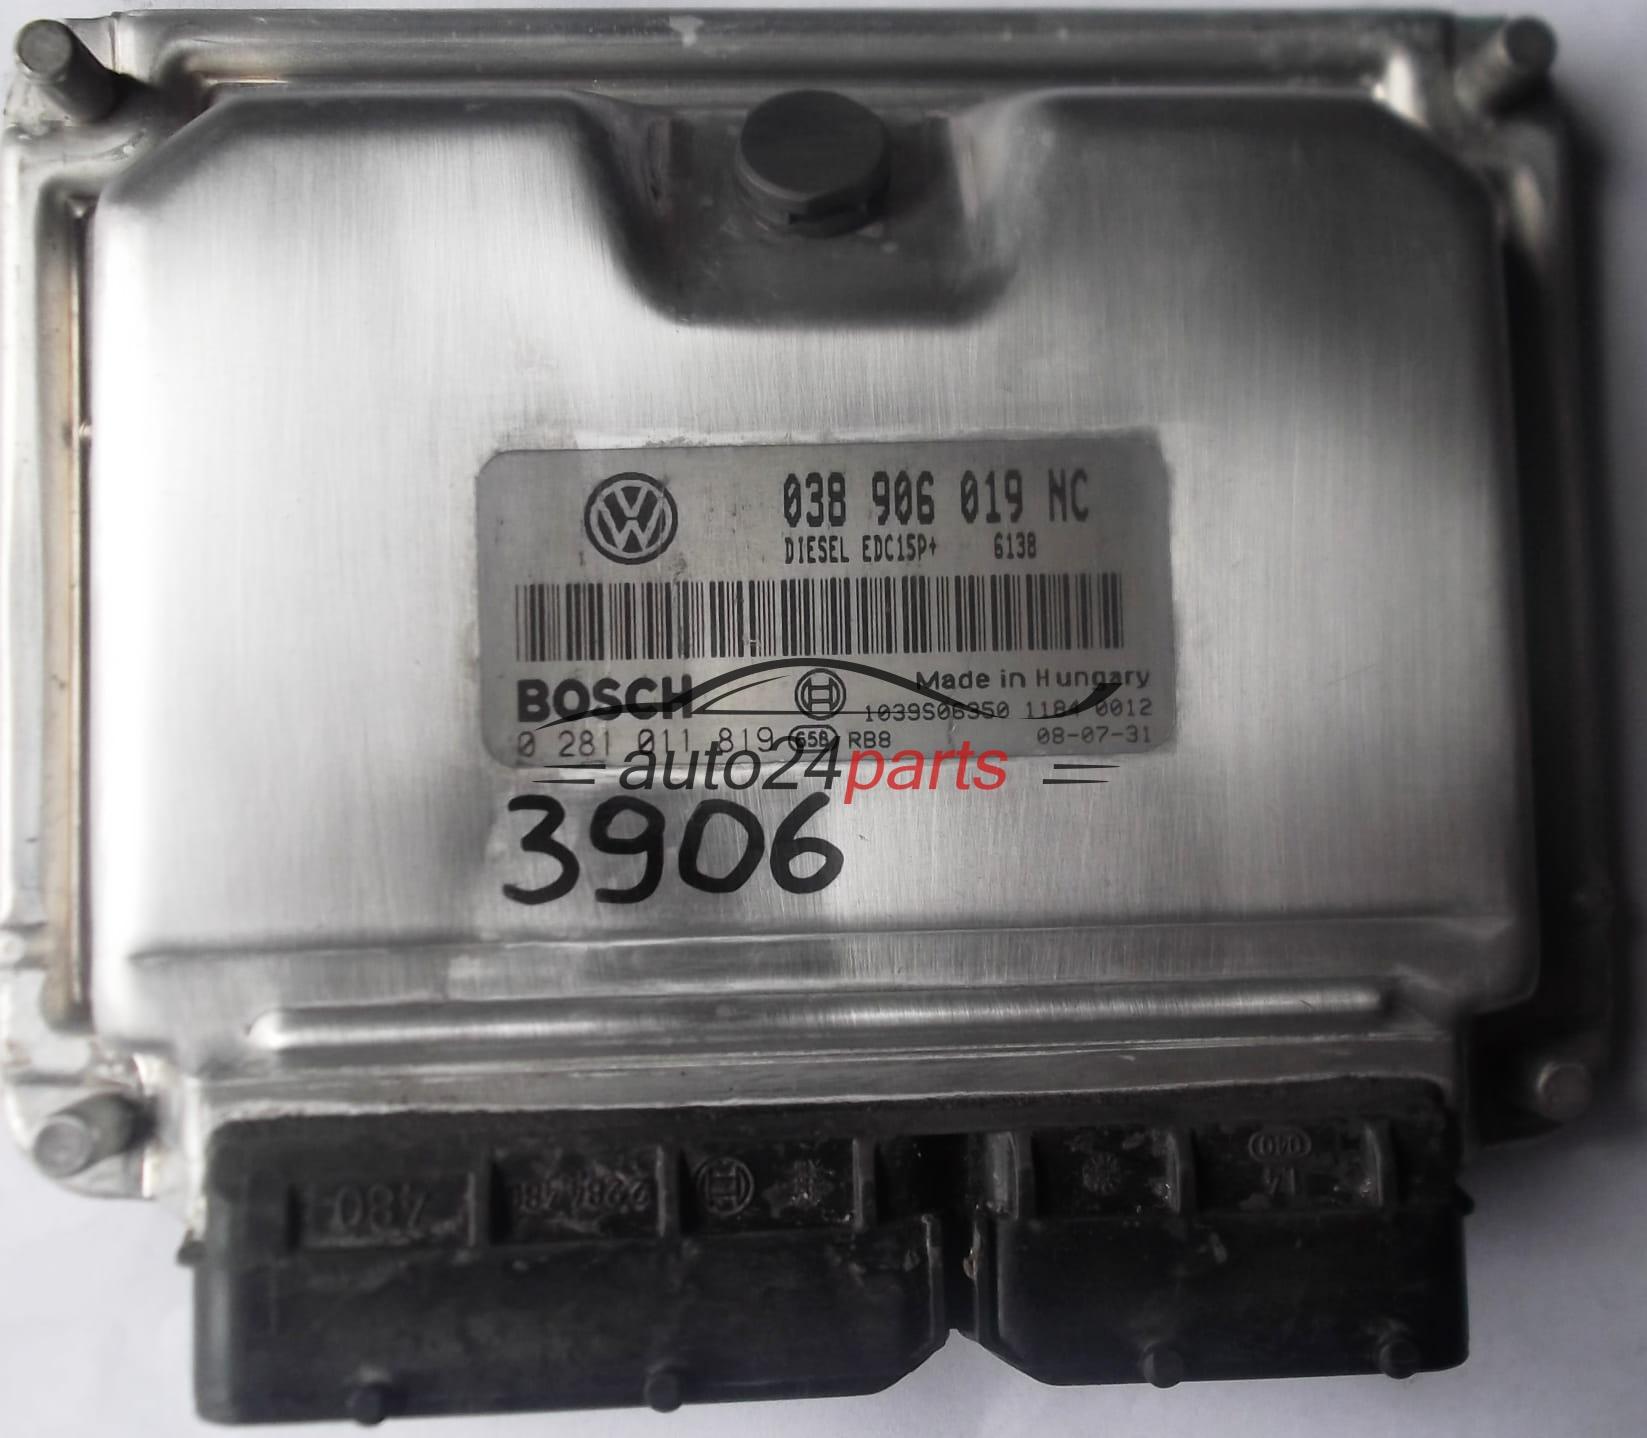 ECU ENGINE CONTROLLER VW VOLKSWAGEN POLO 1 9 TDI 038906019NC, 038 906 019  NC, BOSCH 0281011819, 0 281 011 819, DIESEL EDC15P+ 6138 1039S06350